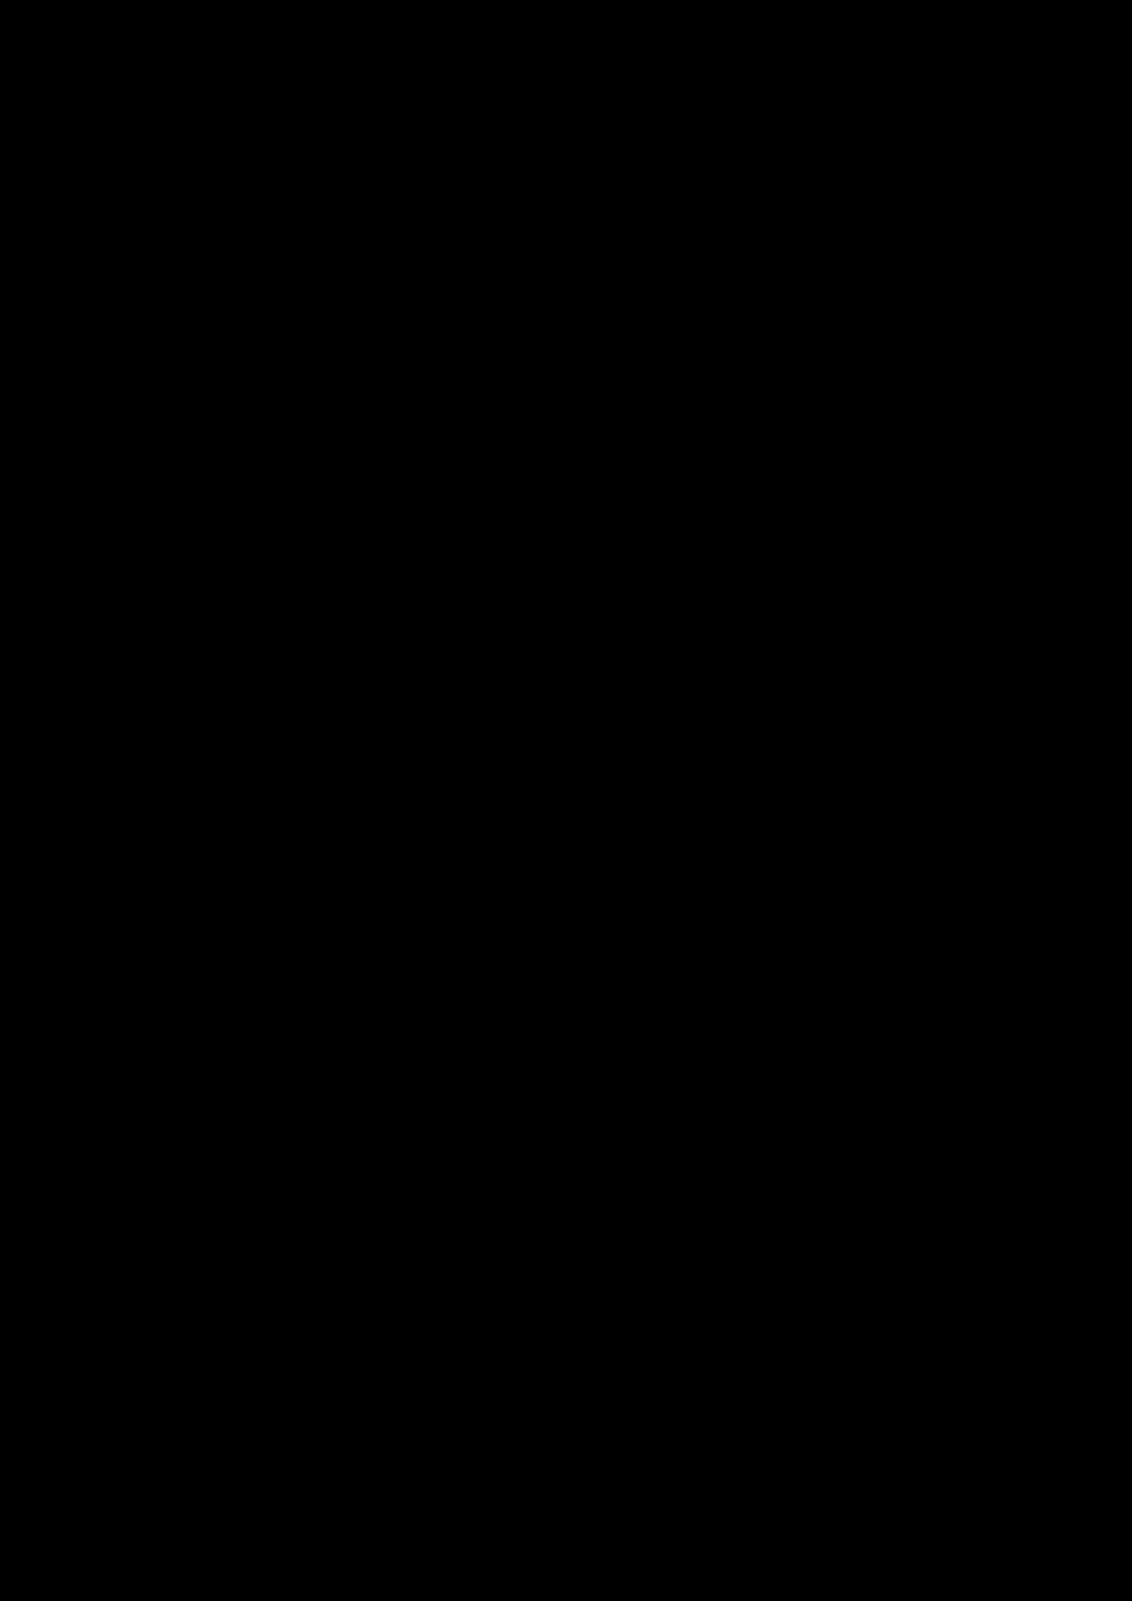 Belyiy sokol slide, Image 33